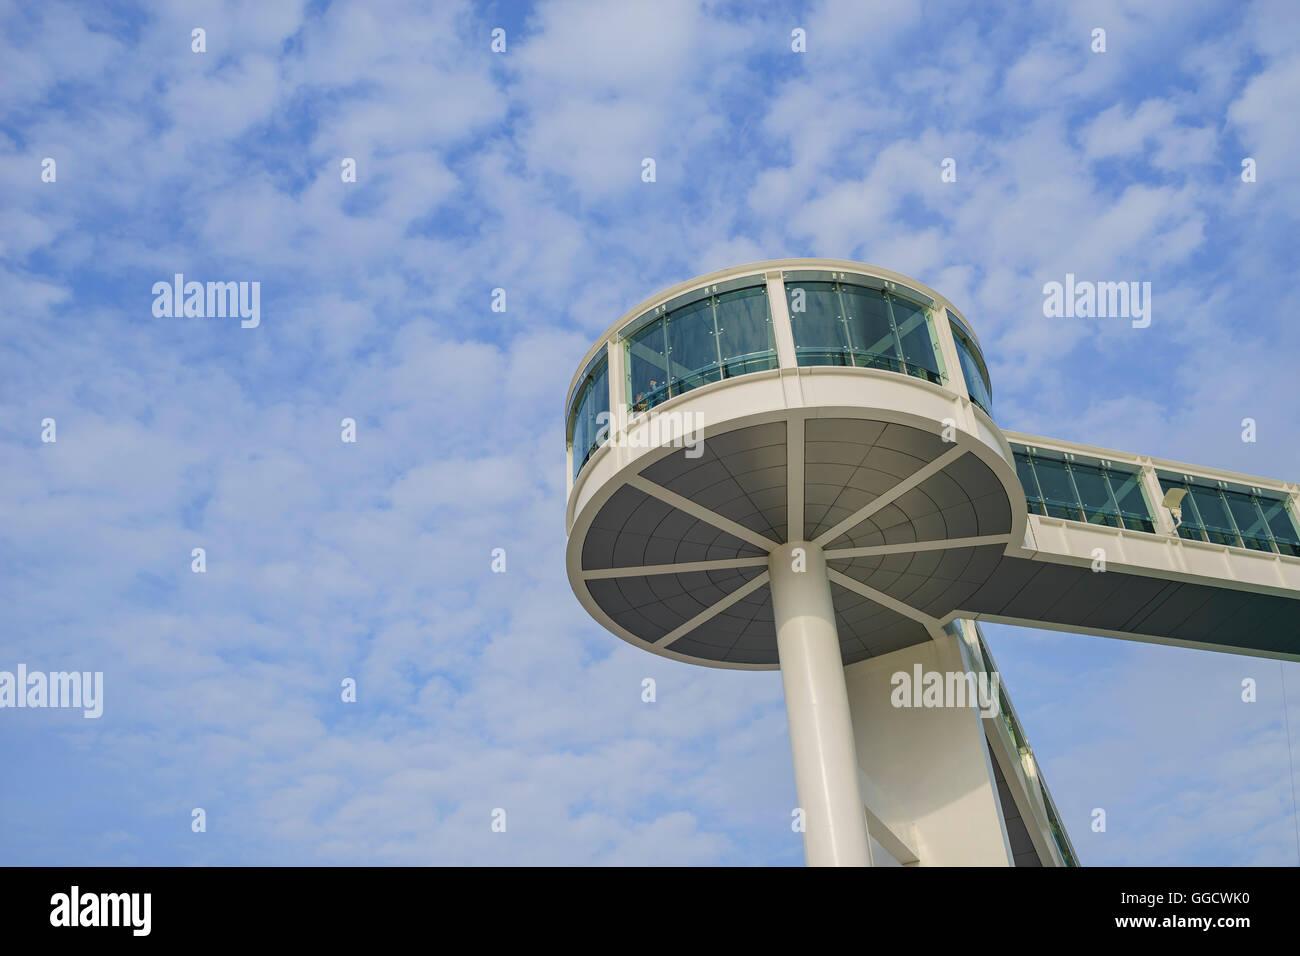 Macau, MAY18: Circle building of Science museum on MAY 18, 2016 at Macau - Stock Image